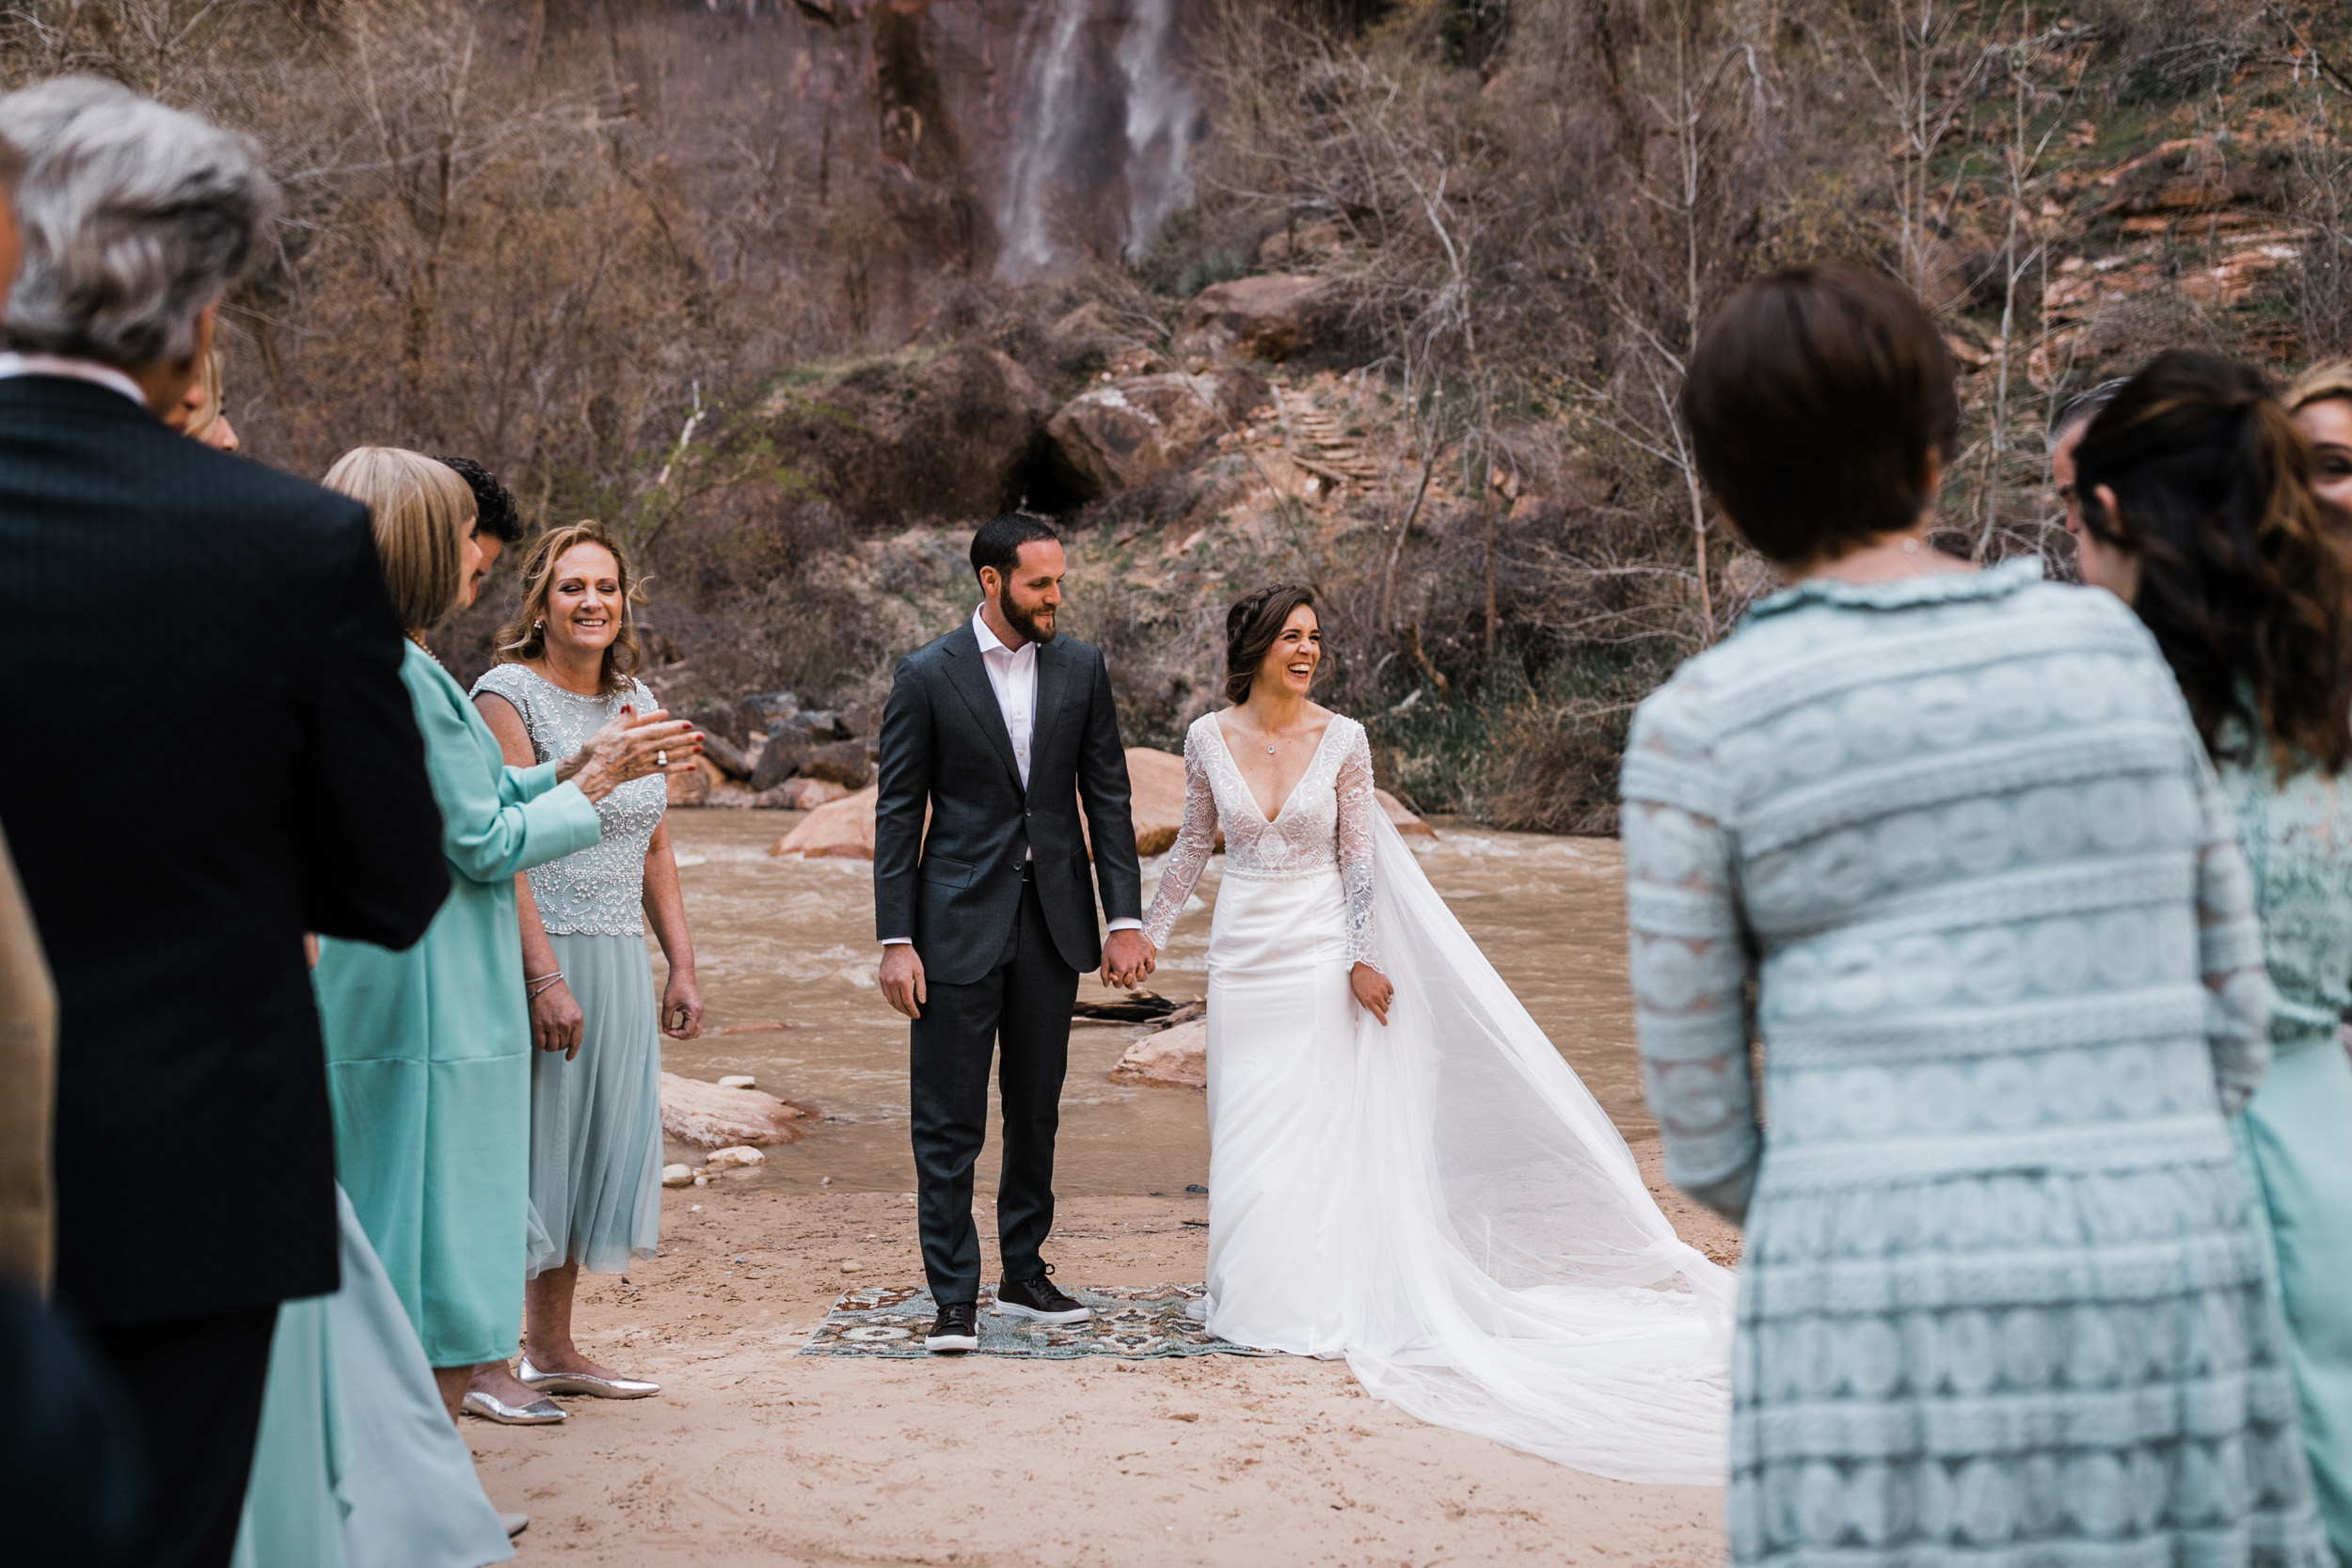 Zion-National-Park-Adventure-Wedding-Hearnes-Elopement-Photography-13.jpg